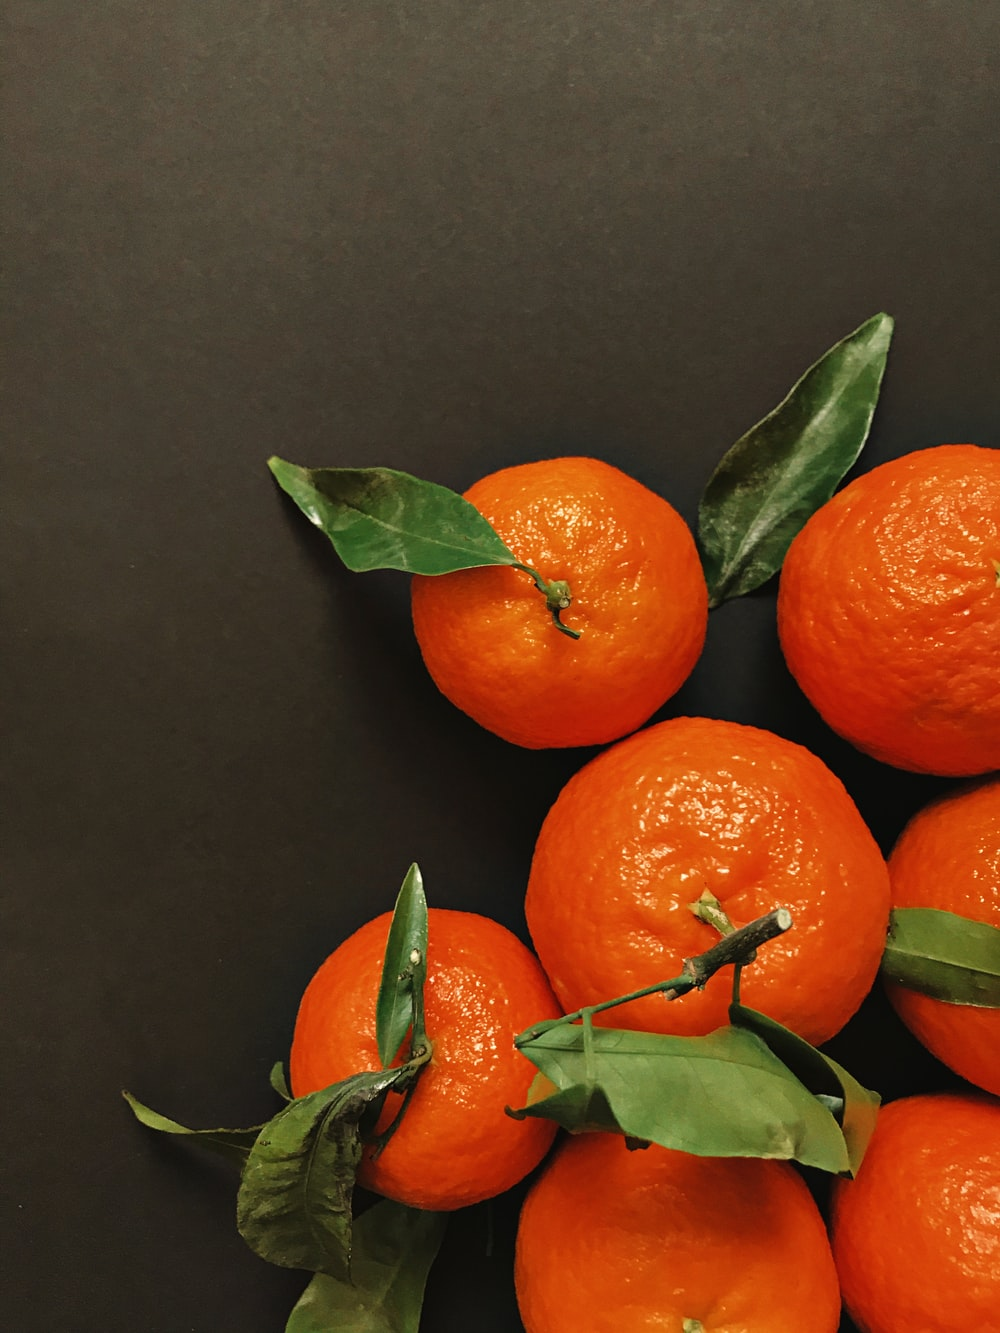 orange tangerines